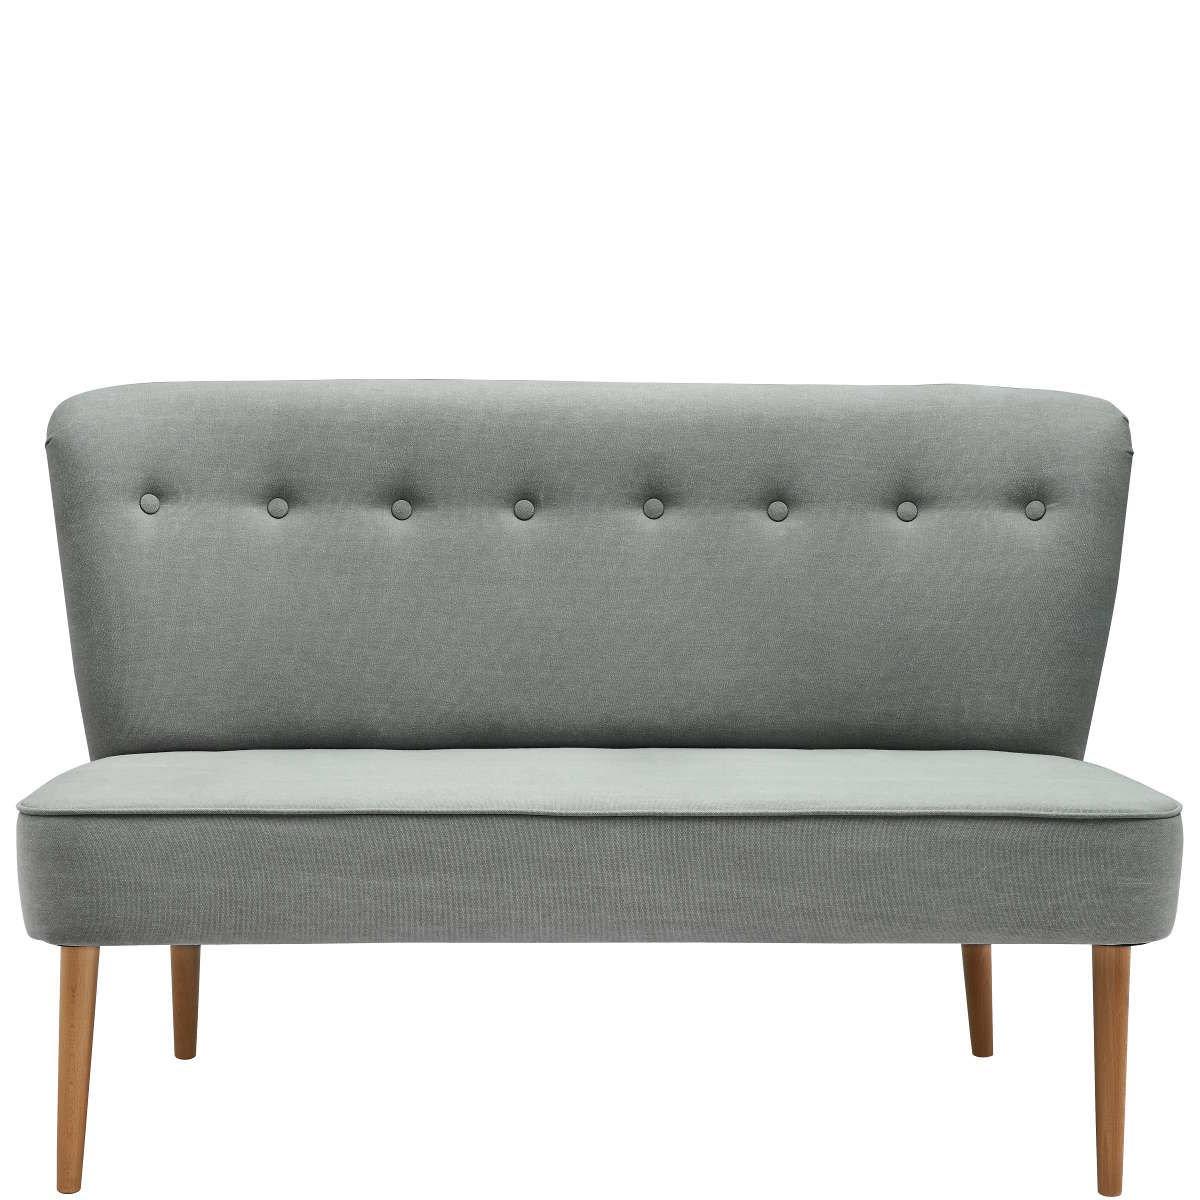 Butlers Cozy Time Sofabank: Amazon.de: Küche & Haushalt